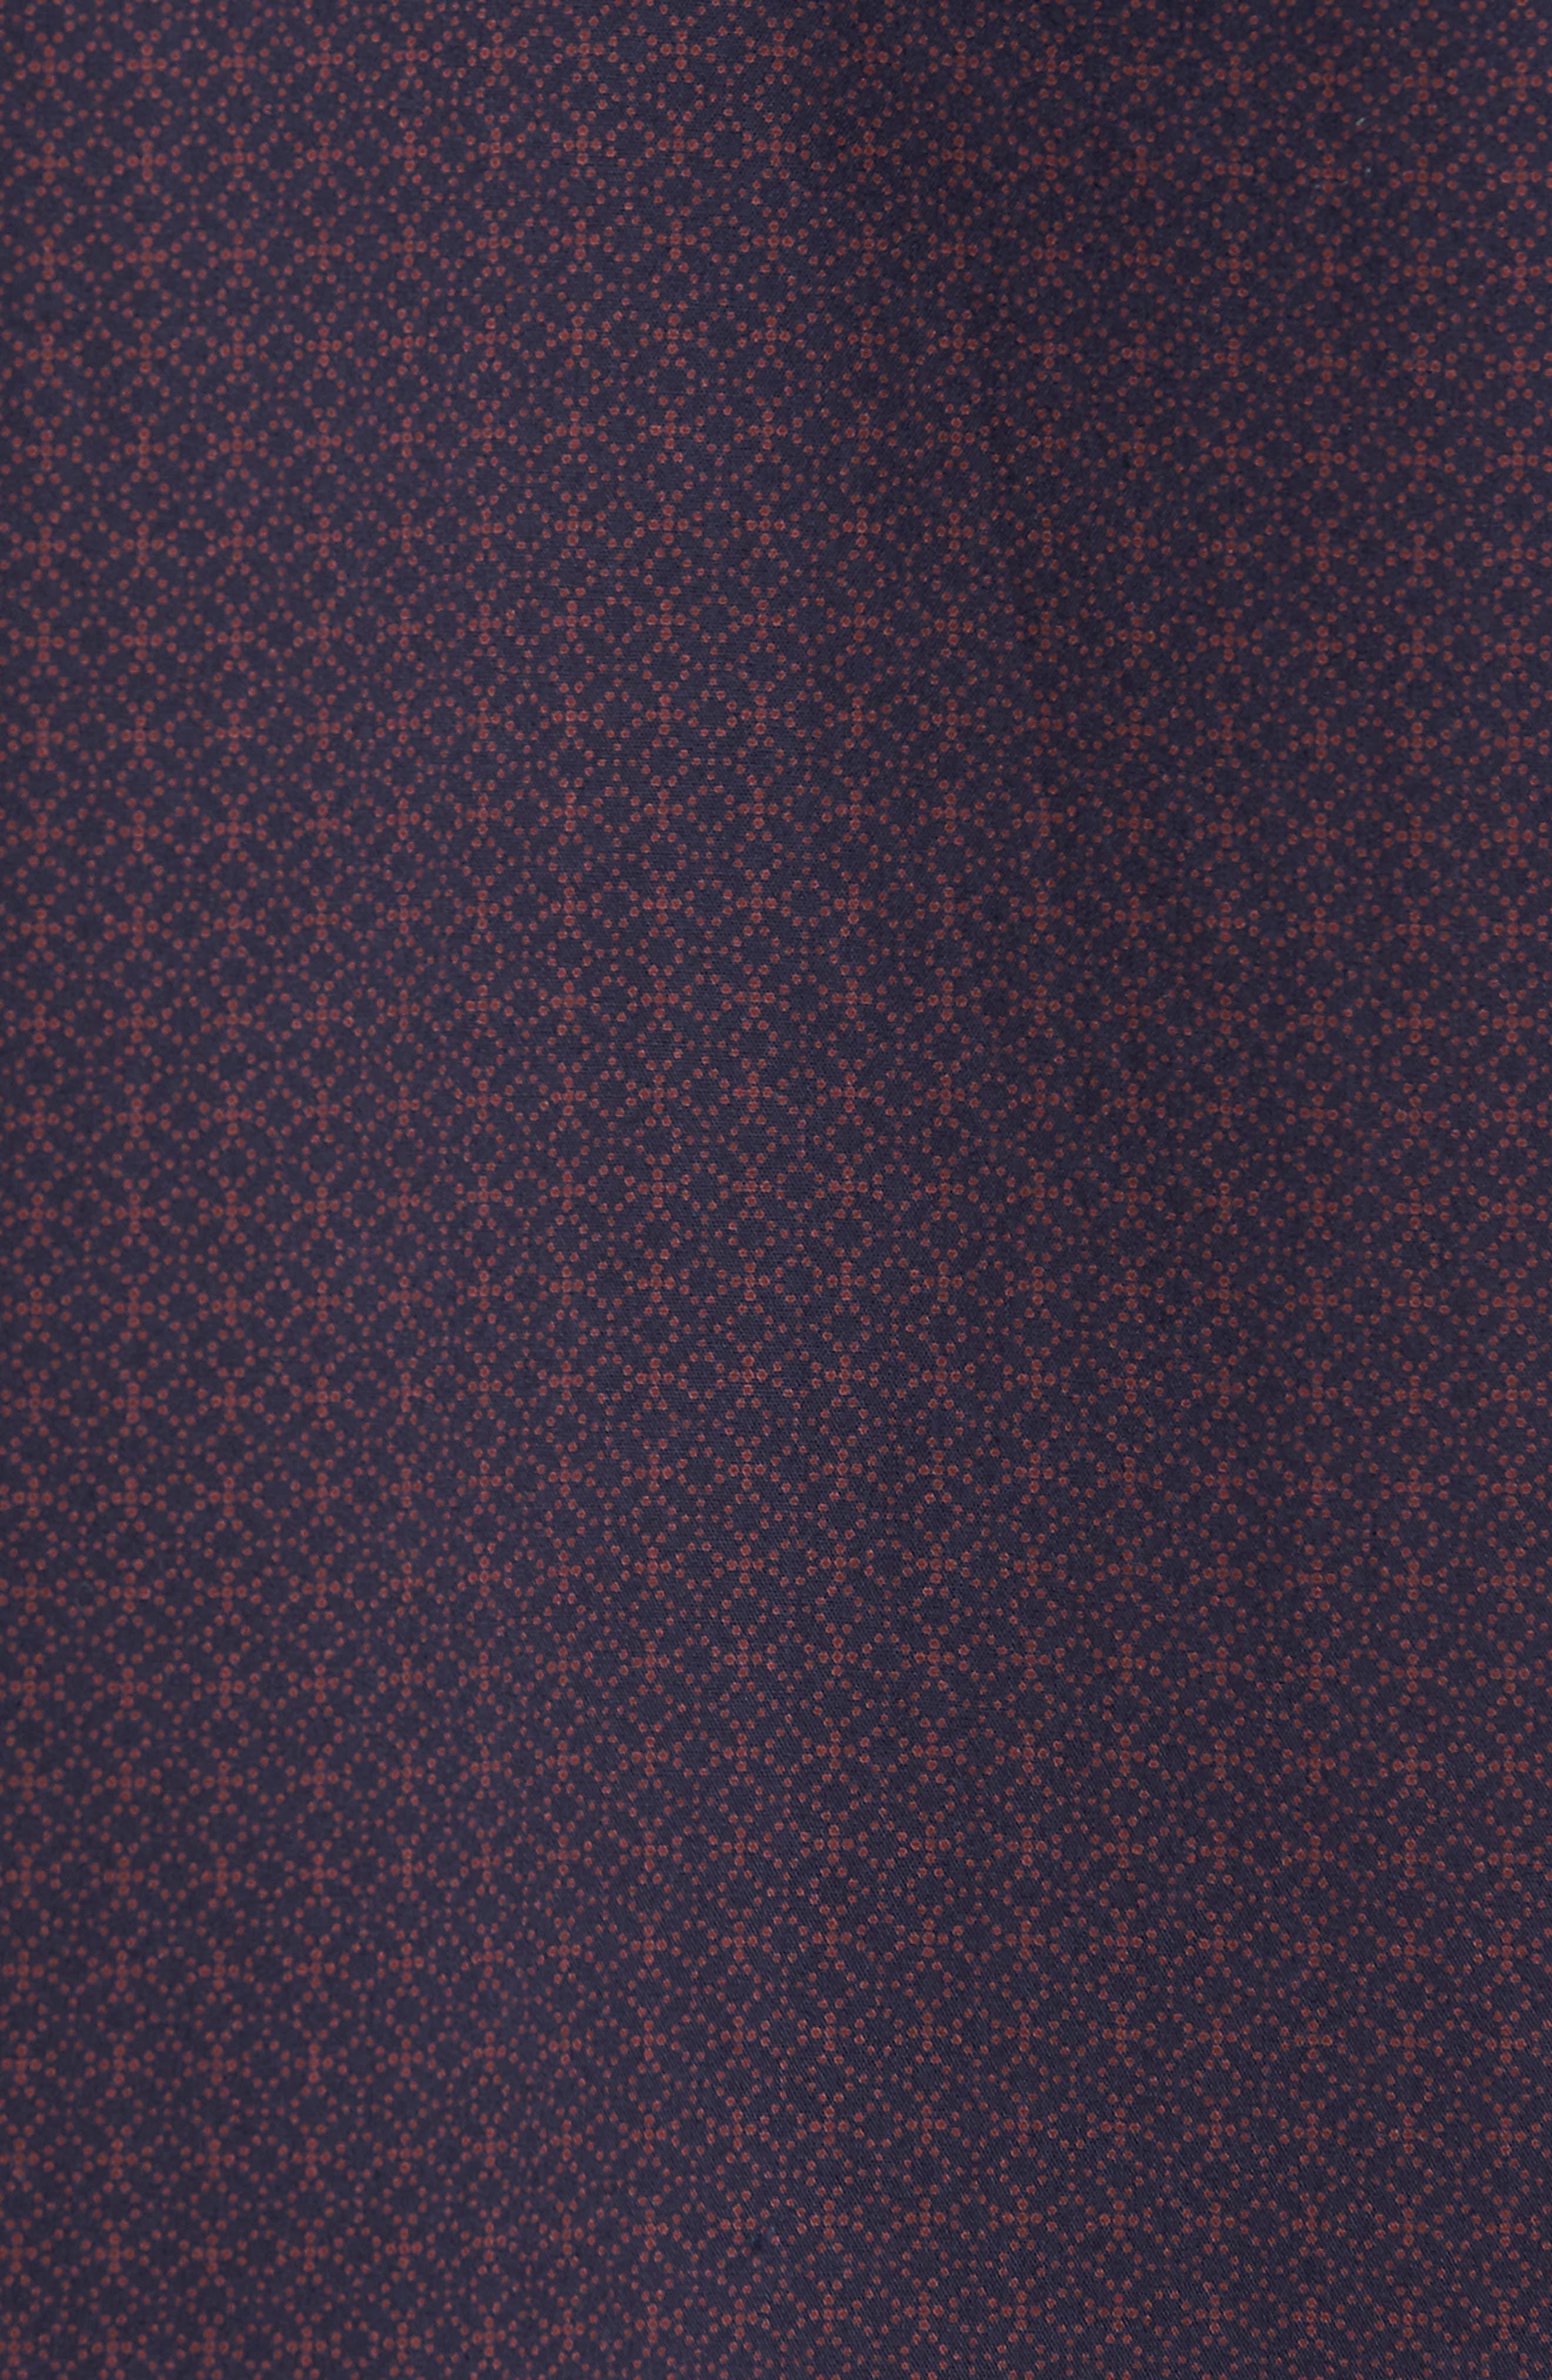 Slim Fit Print Non Iron Sport Shirt,                             Alternate thumbnail 5, color,                             NAVY NIGHT BURGUNDY GEO